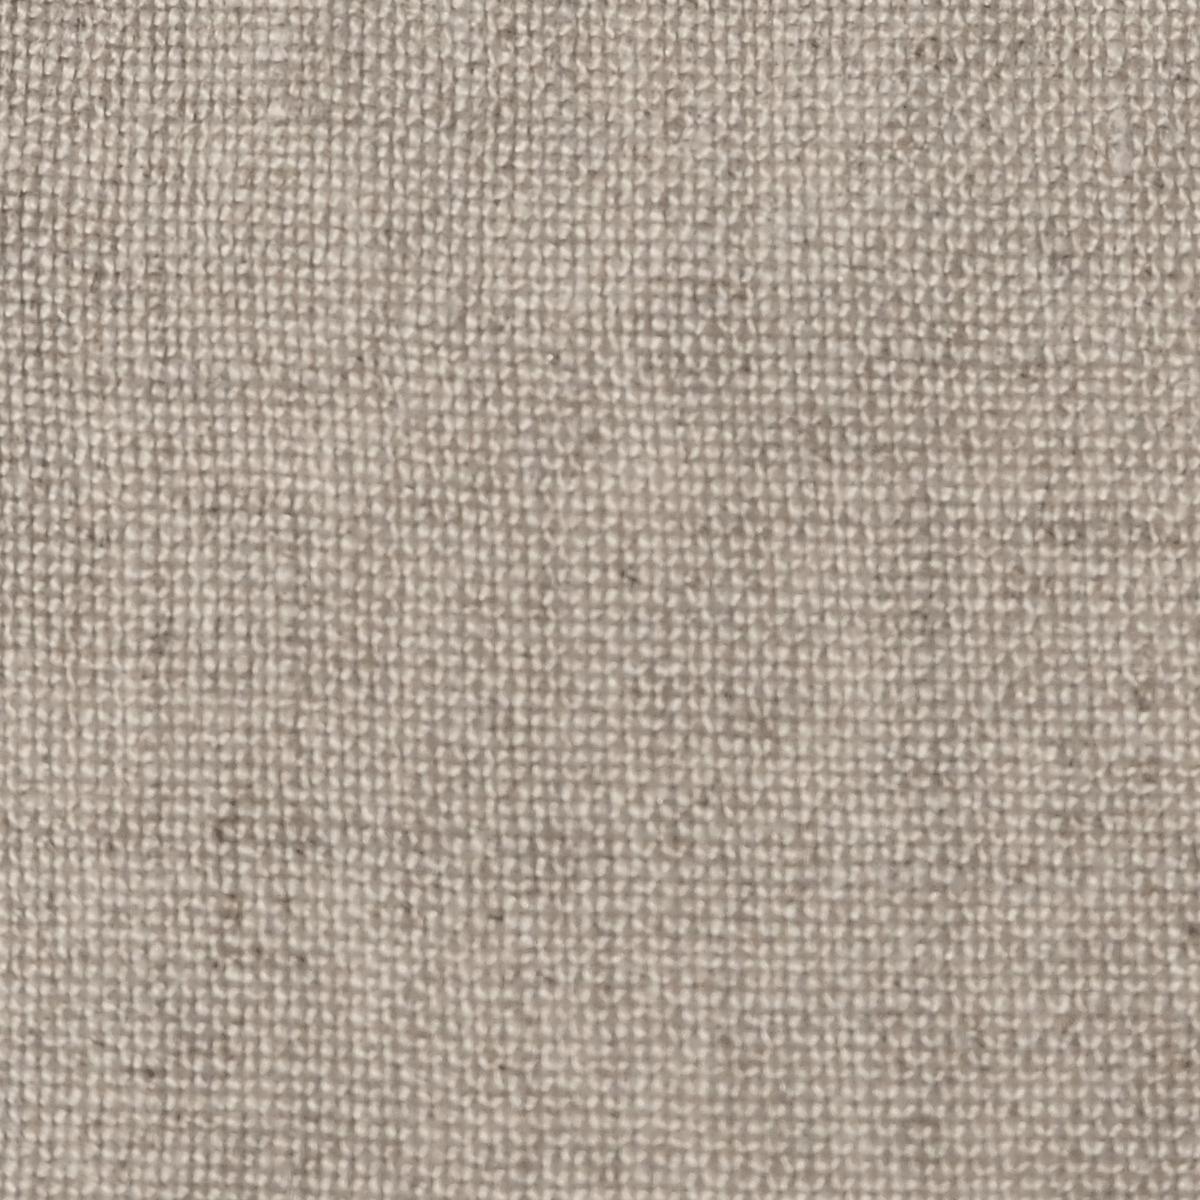 Lino color natural claro